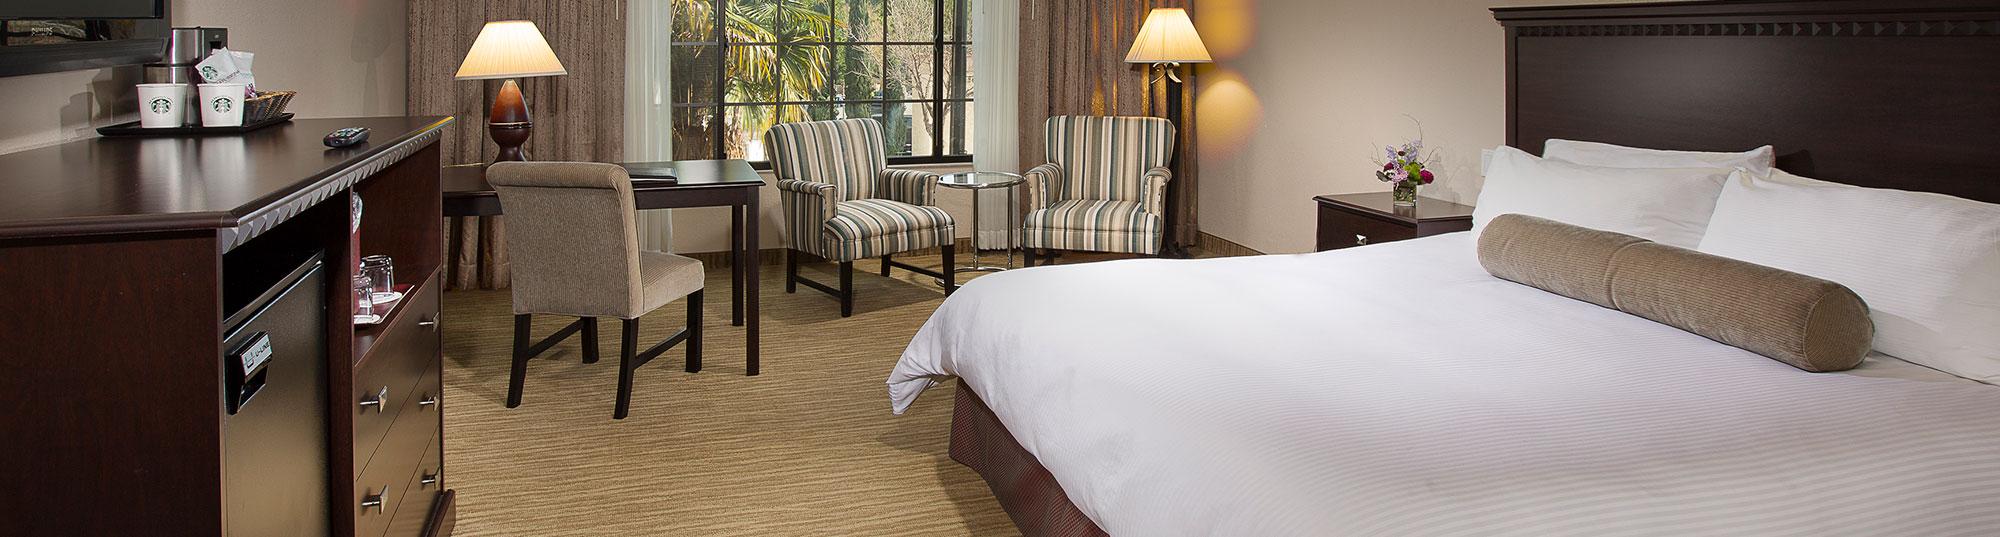 Deluxe King Hotel Burbank Coast Anabelle